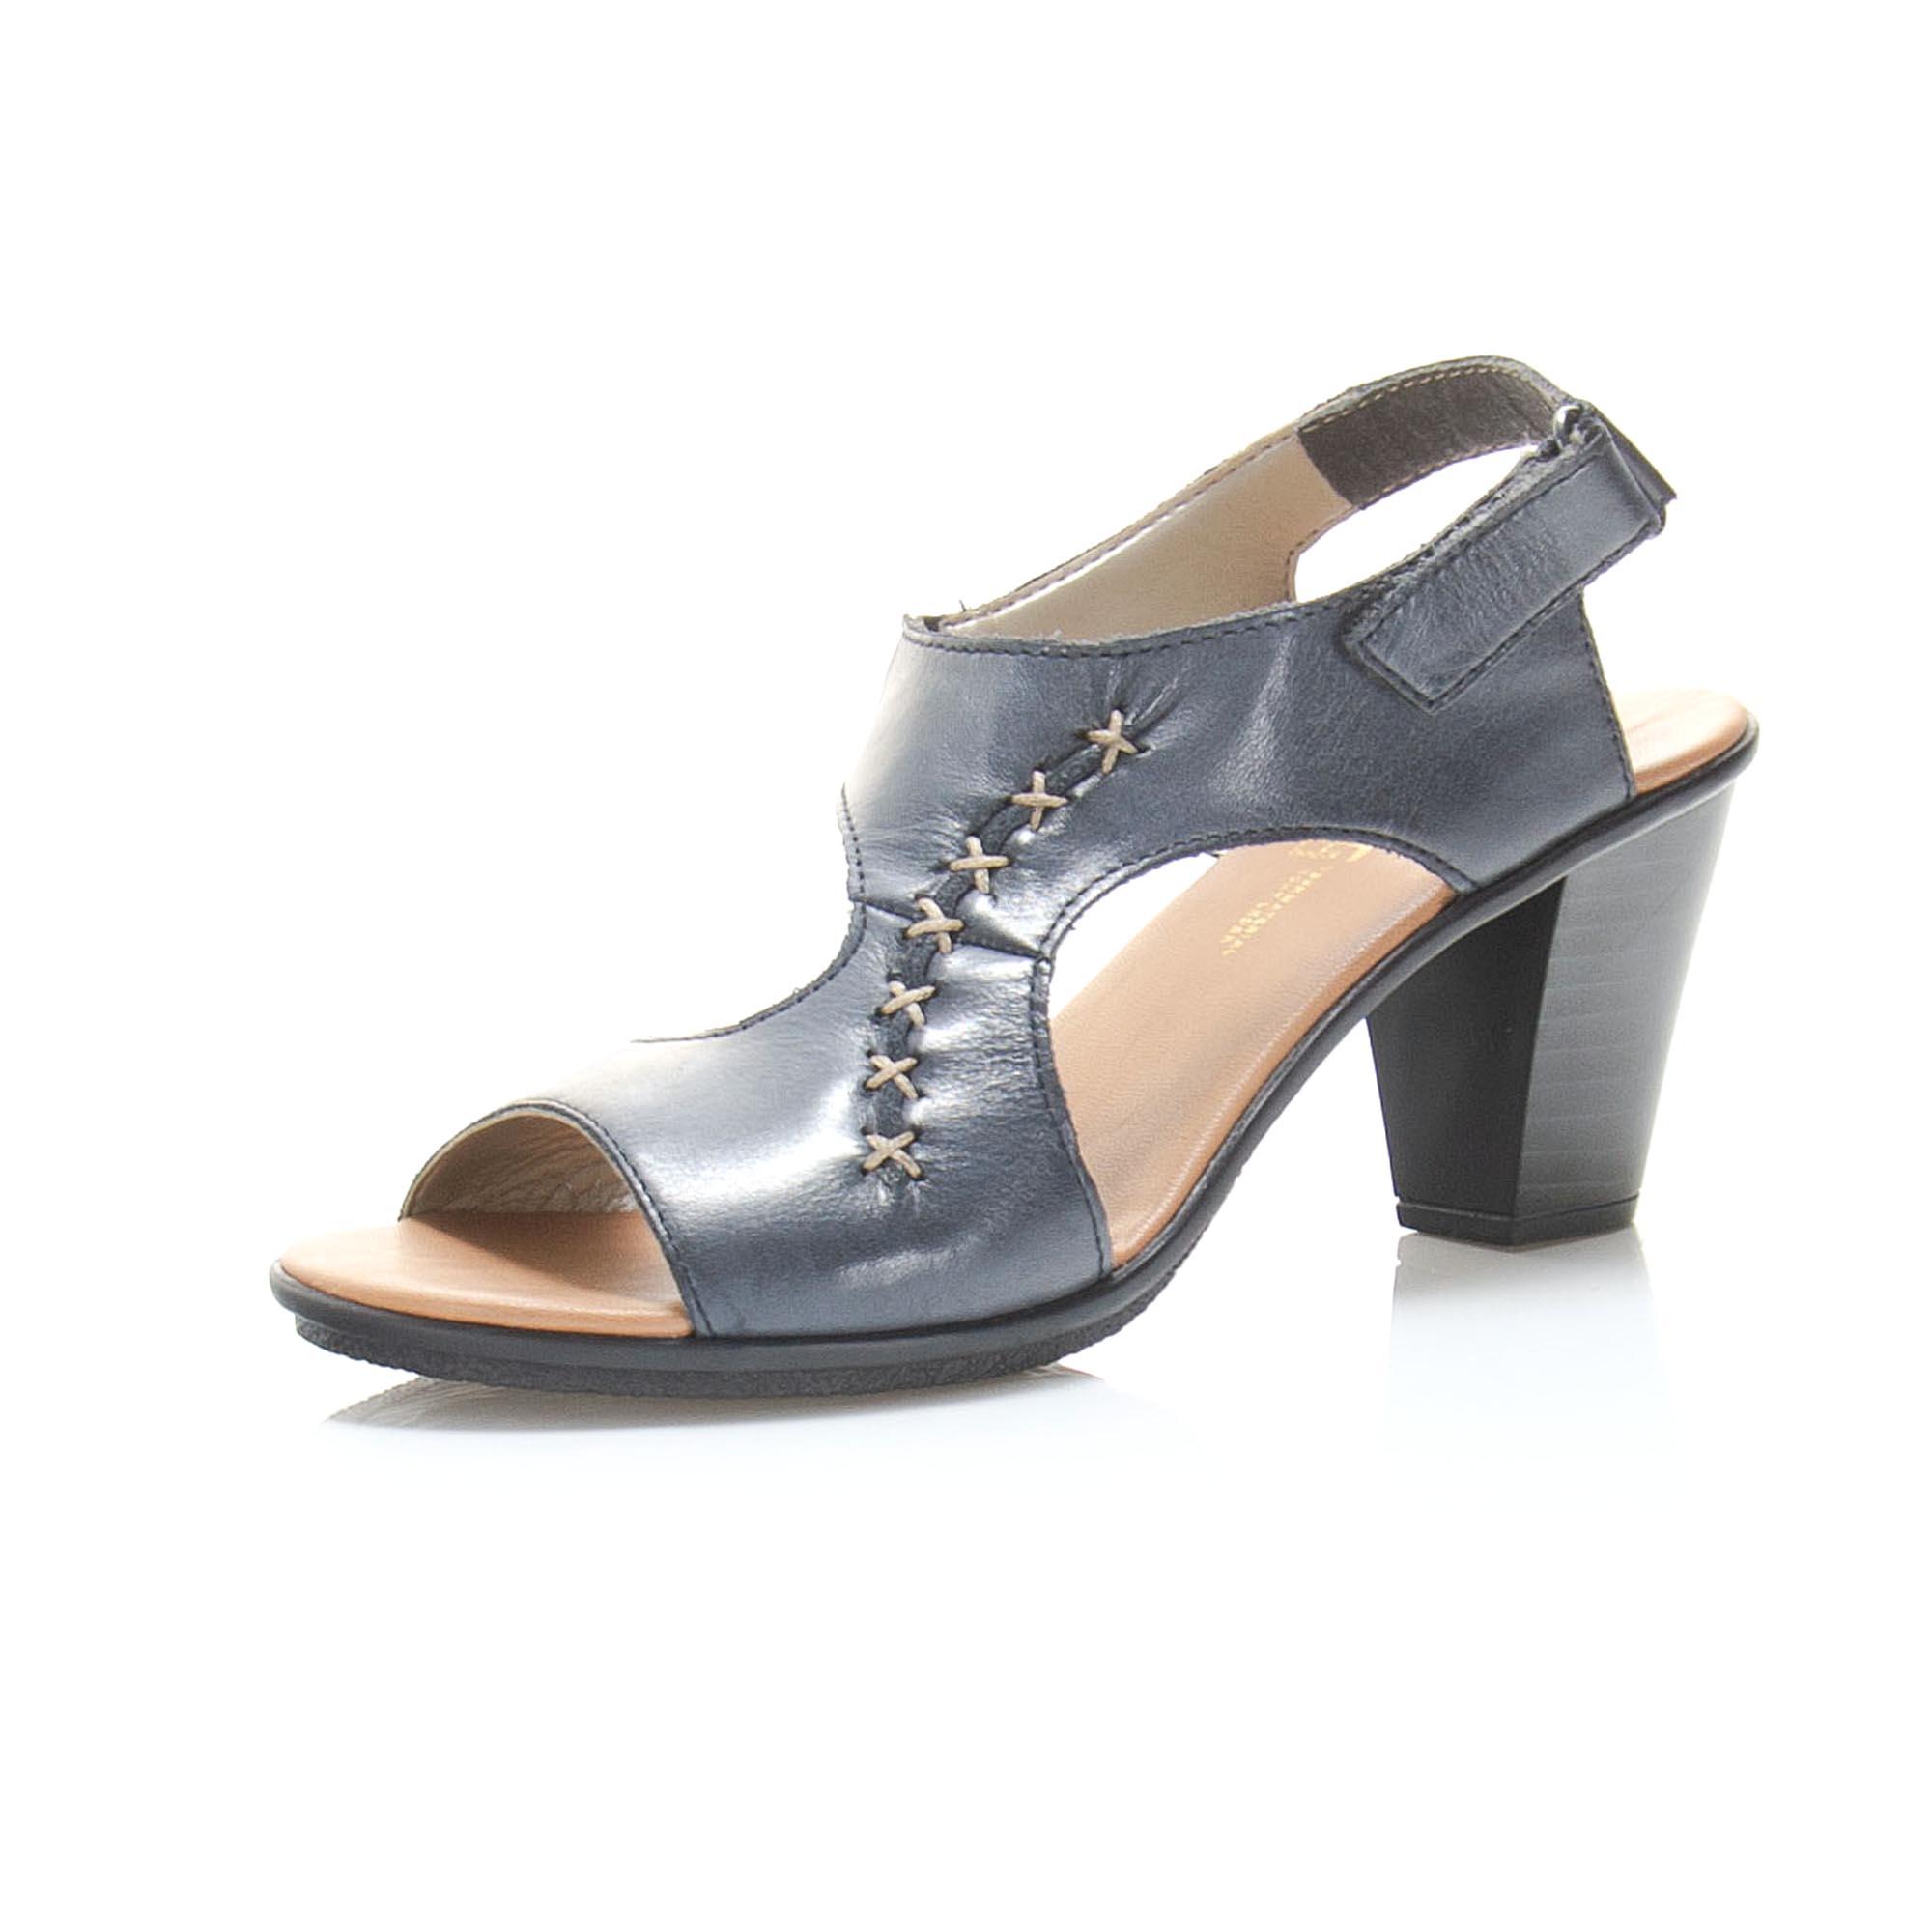 2856296eaa0d detail Dámska obuv RIEKER br 64180-12 BLAU F S 9